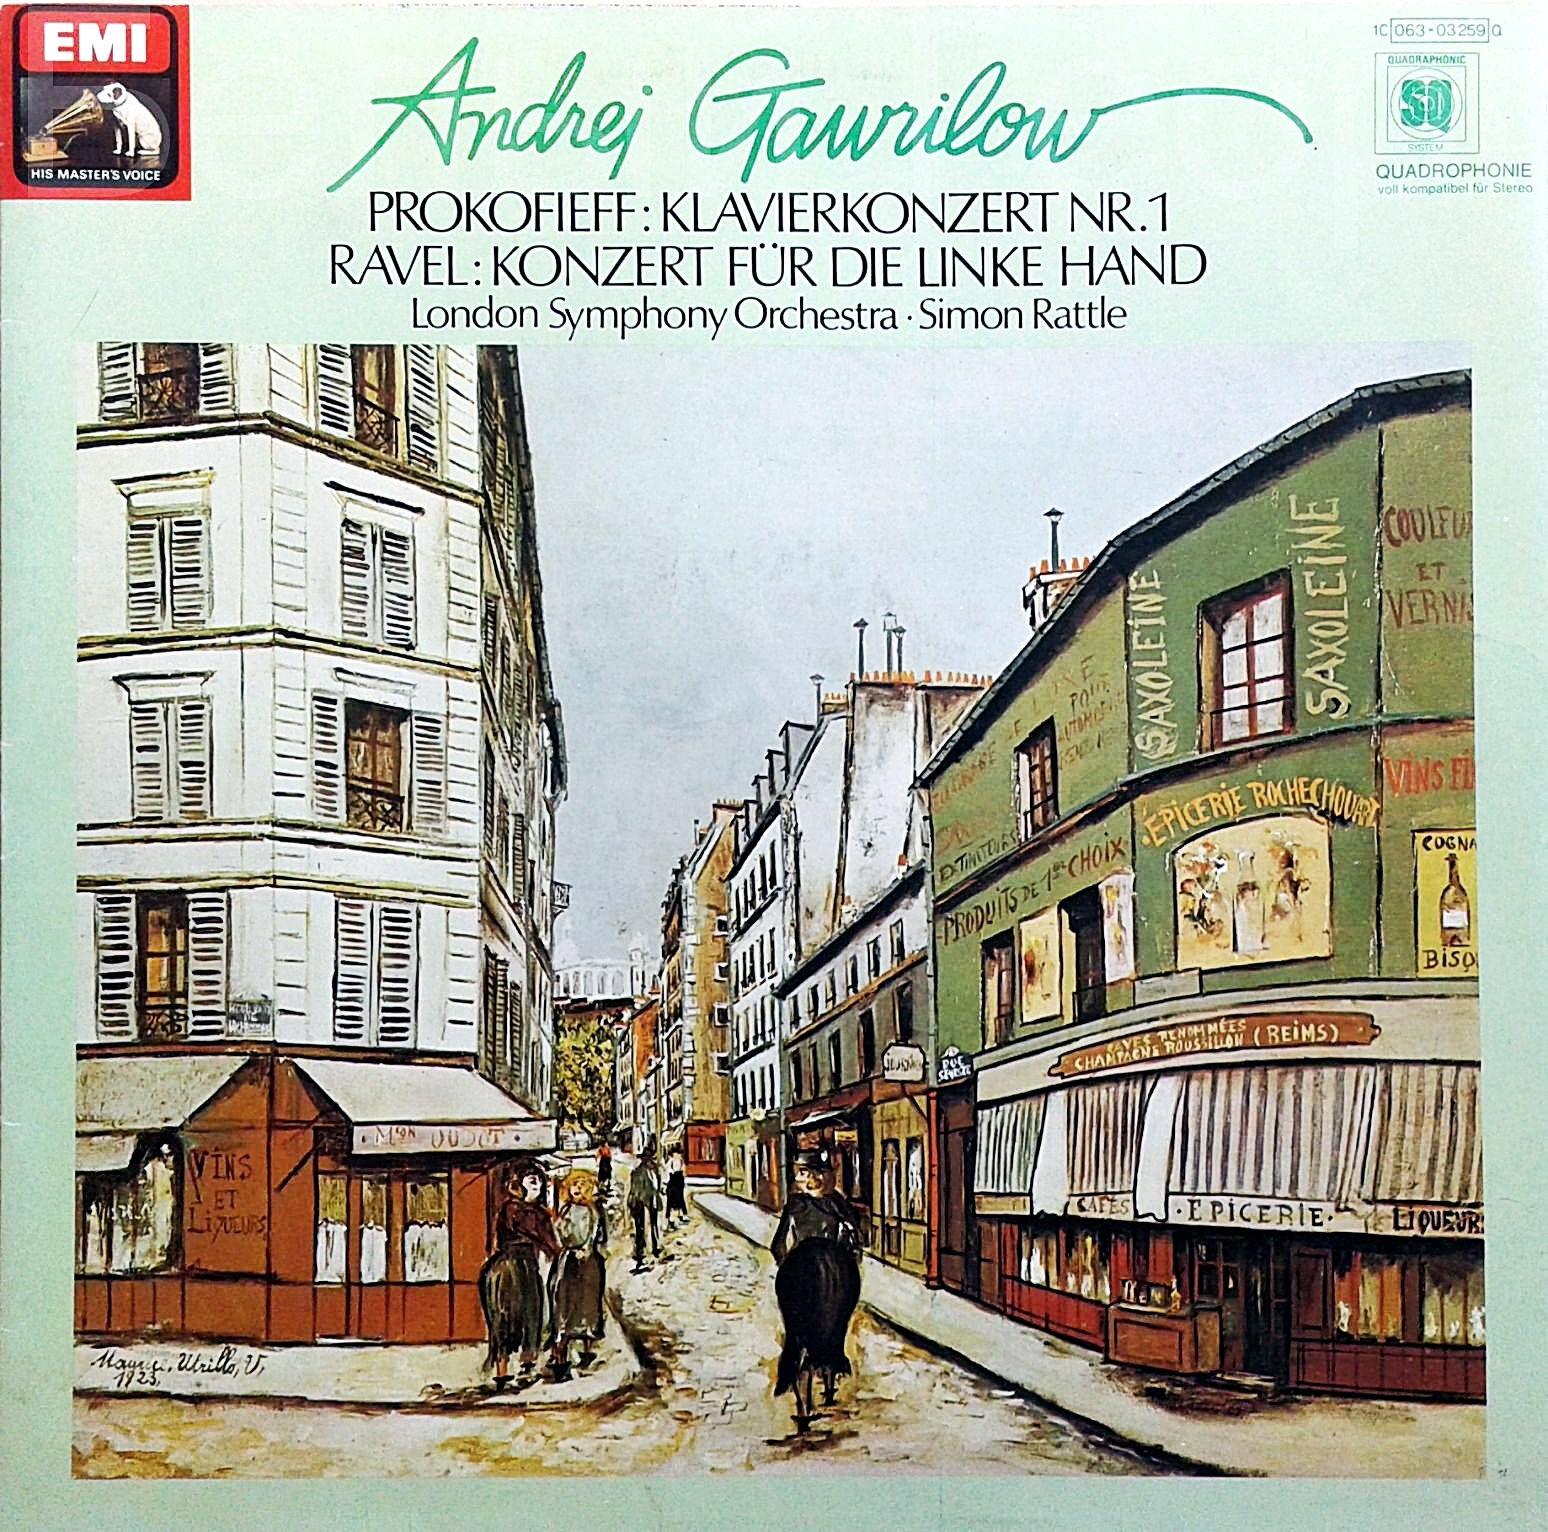 Andrej Gawrilow, Prokofiev, Ravel, The London Symphony Orchestra Klavierkonzert Nr. 1 / Konzert Fur Die Linke Hand